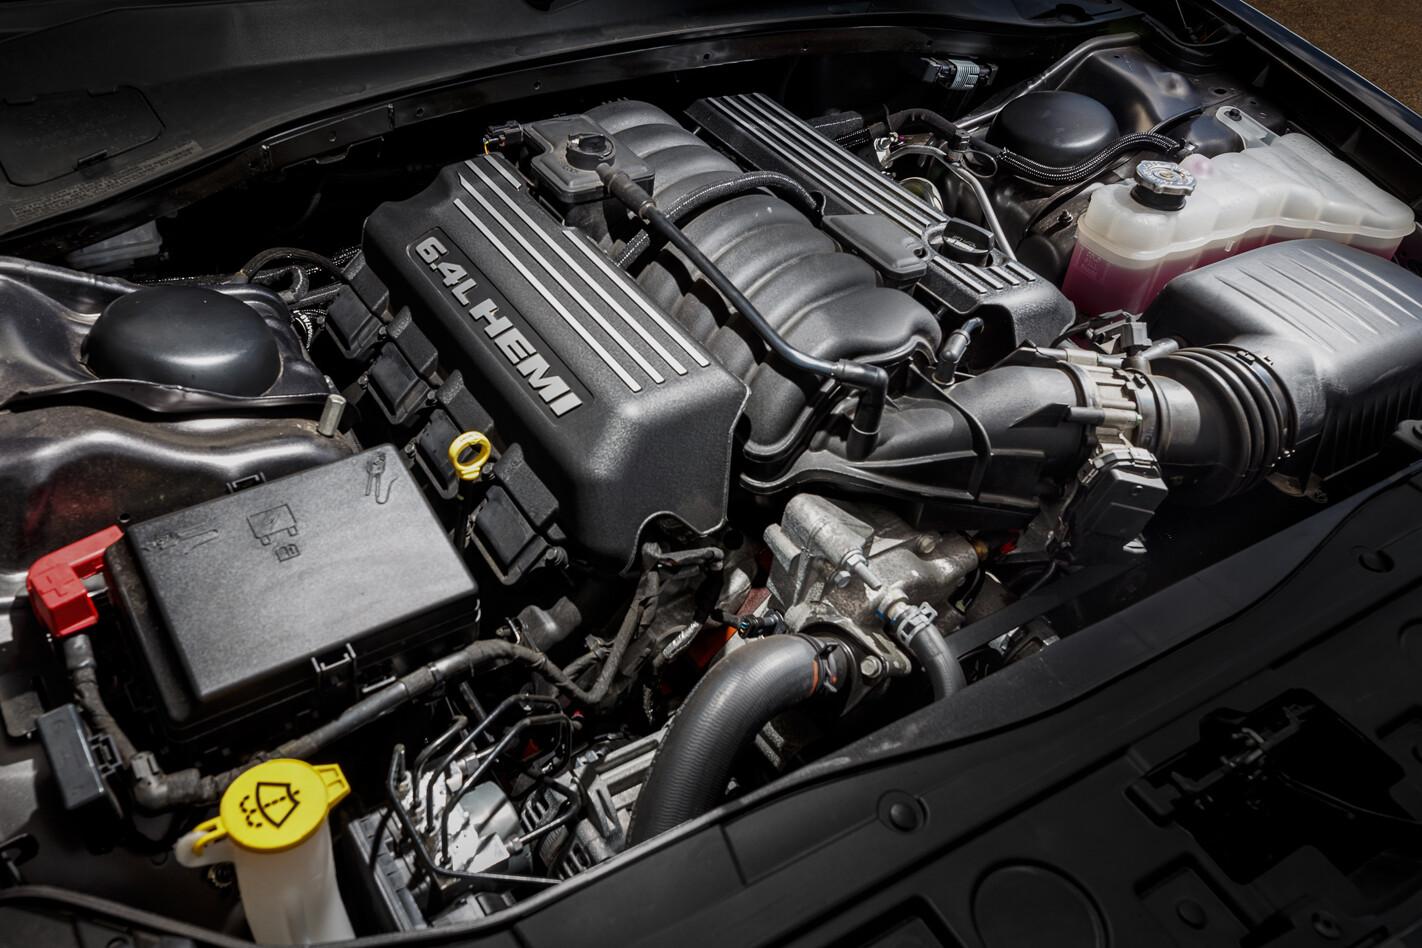 SRT engine